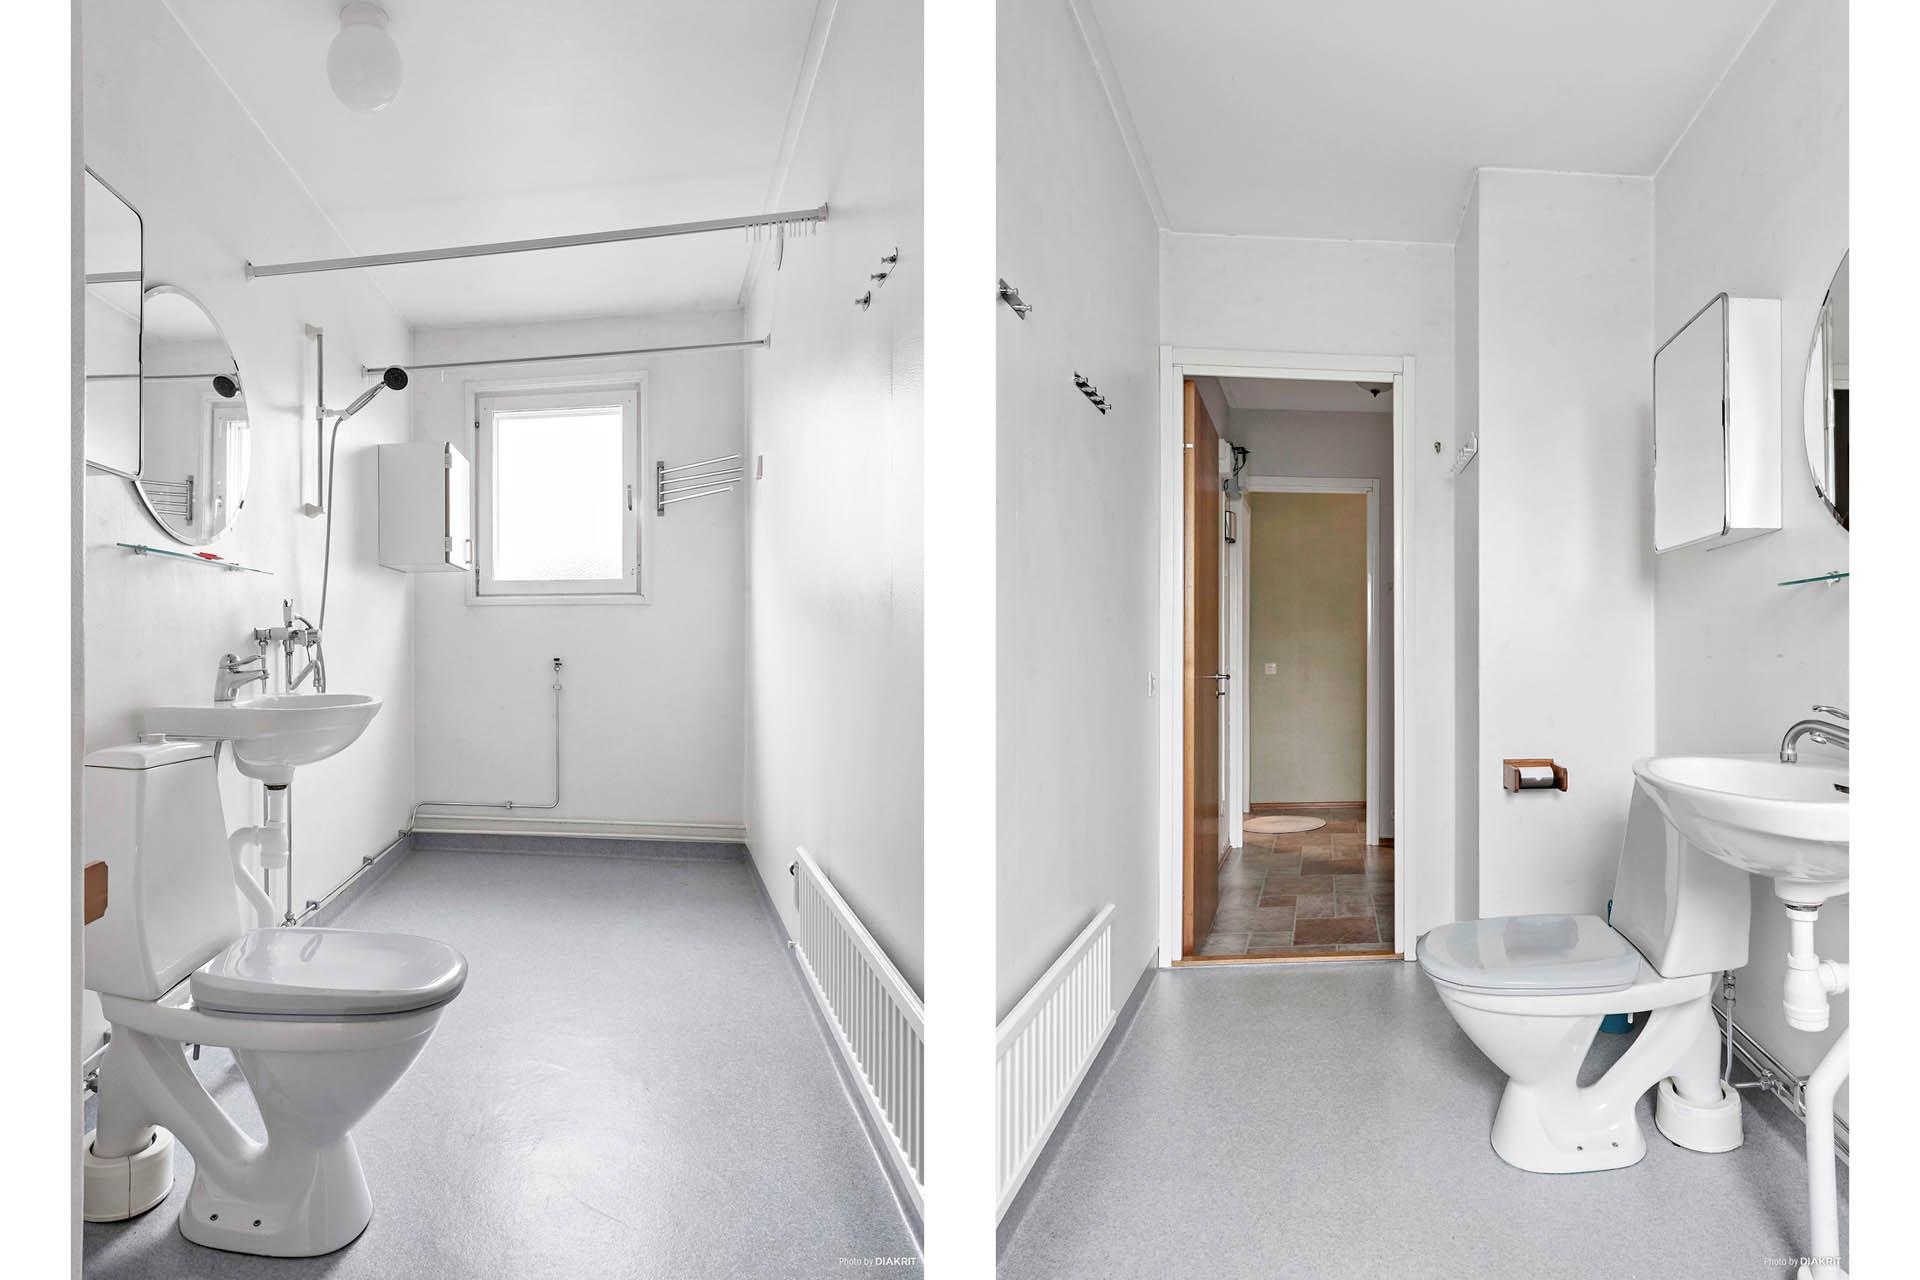 Toalett med dusch.